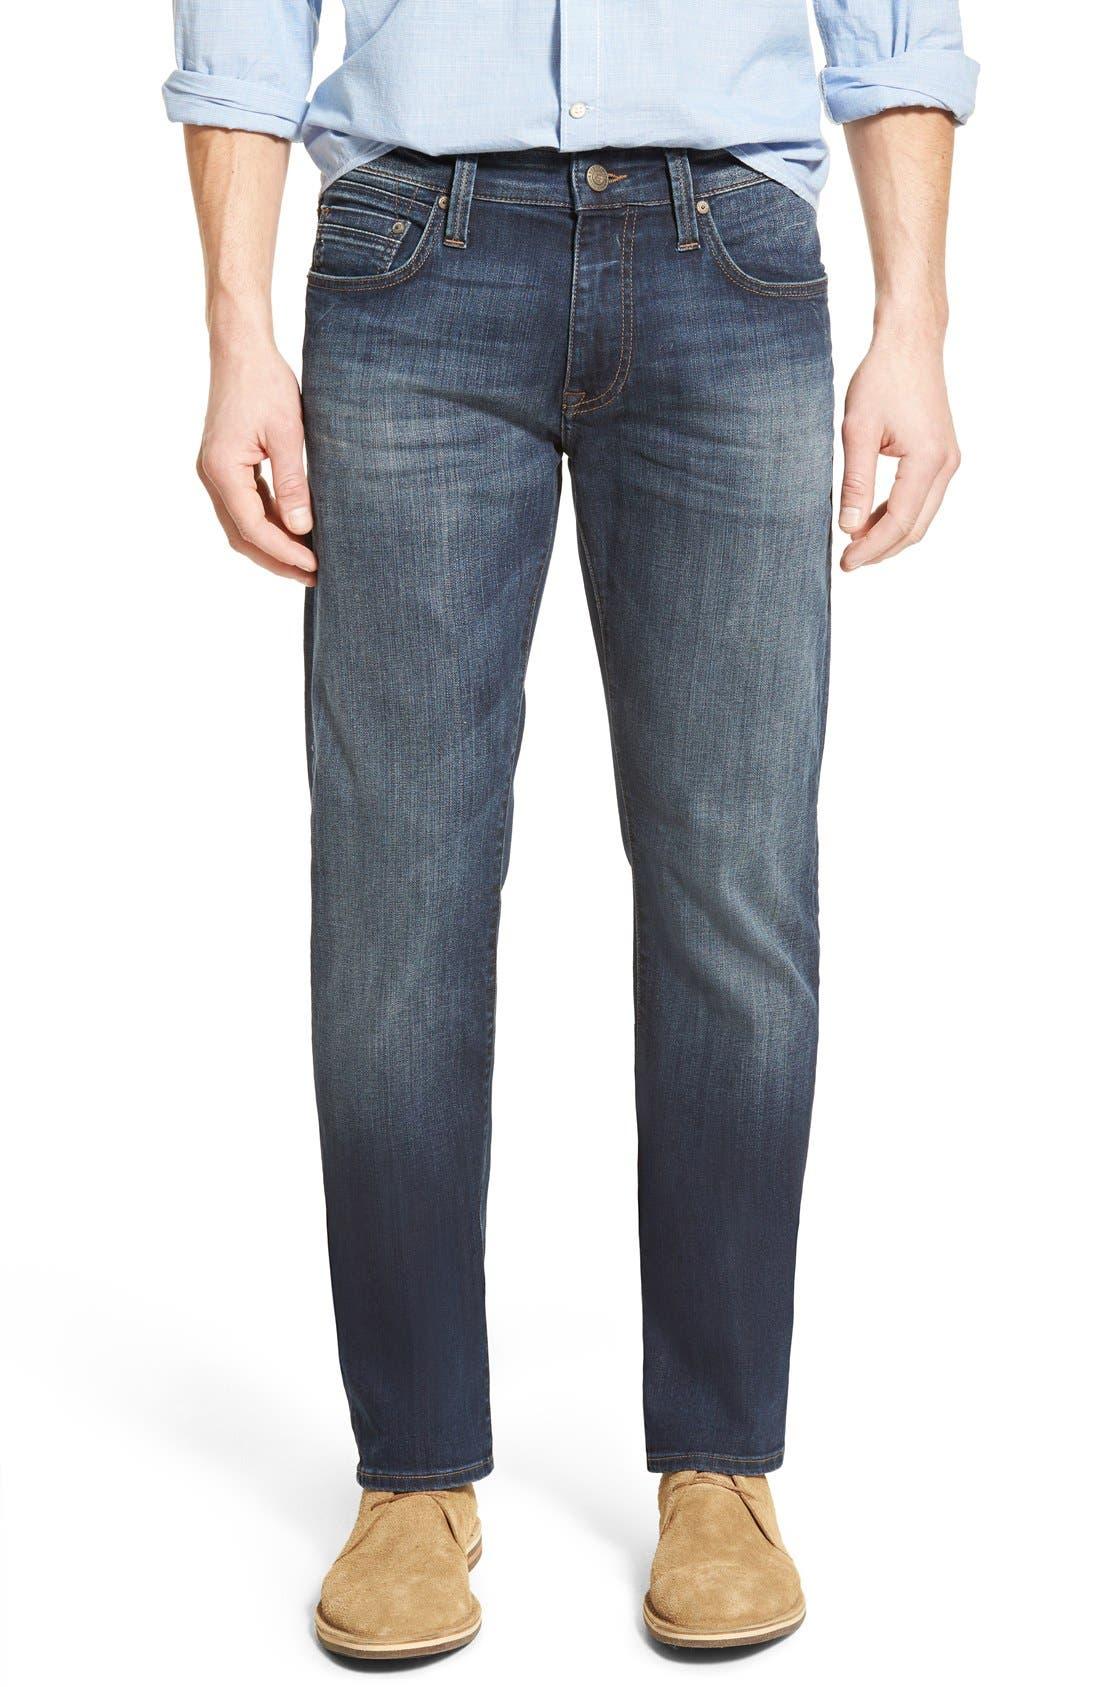 Zach Straight Leg Jeans,                         Main,                         color, DARK BRUSHED WILLIAMSBURG